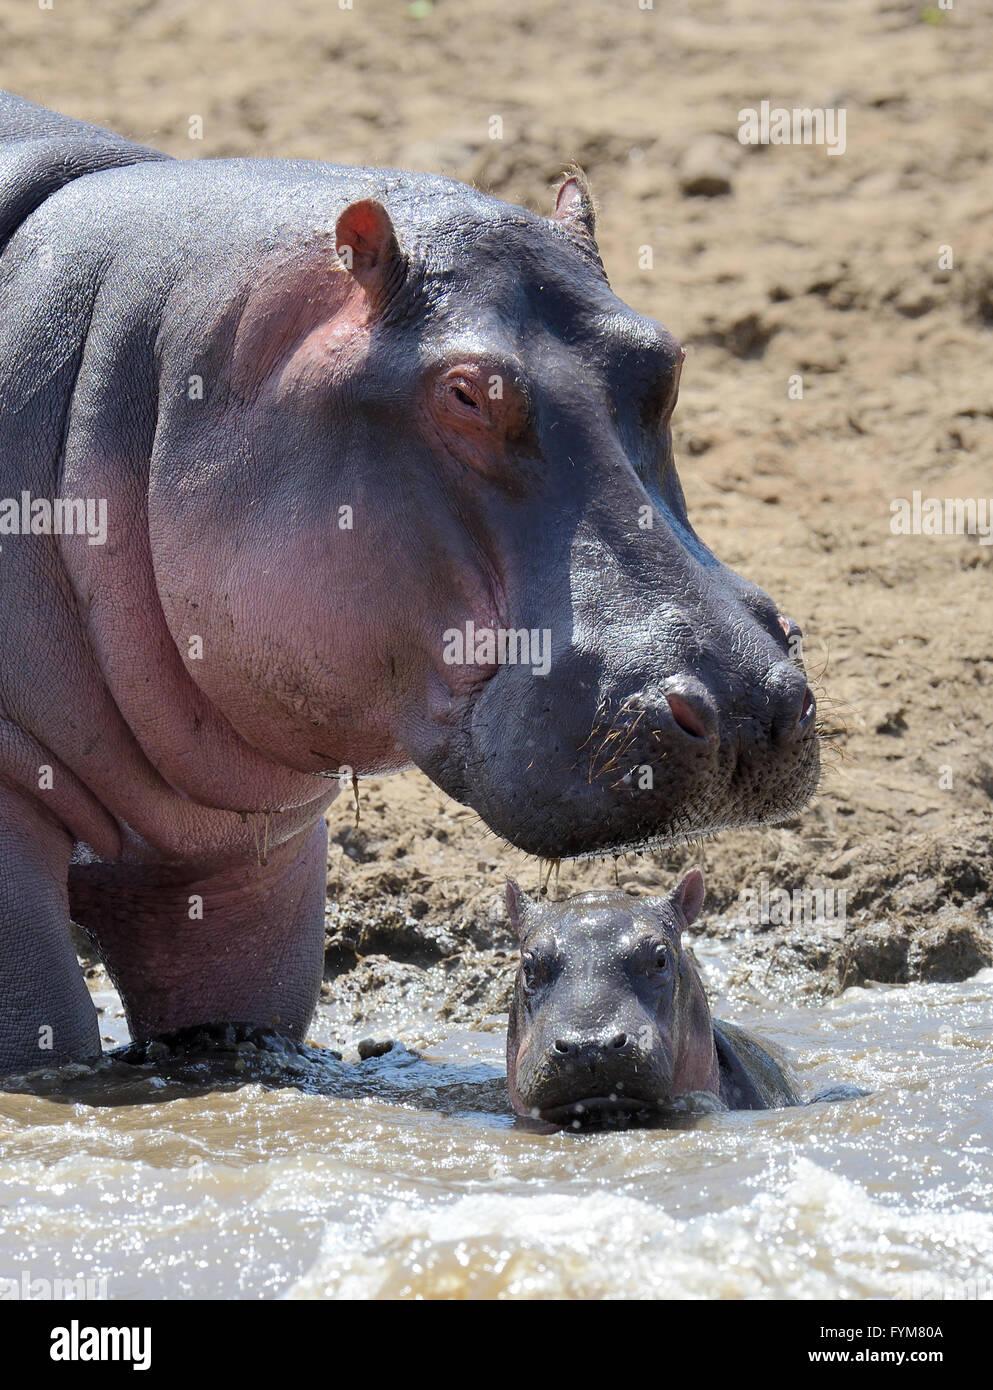 Hippo family (Hippopotamus amphibius) outside the water. Kenya, Africa Stock Photo